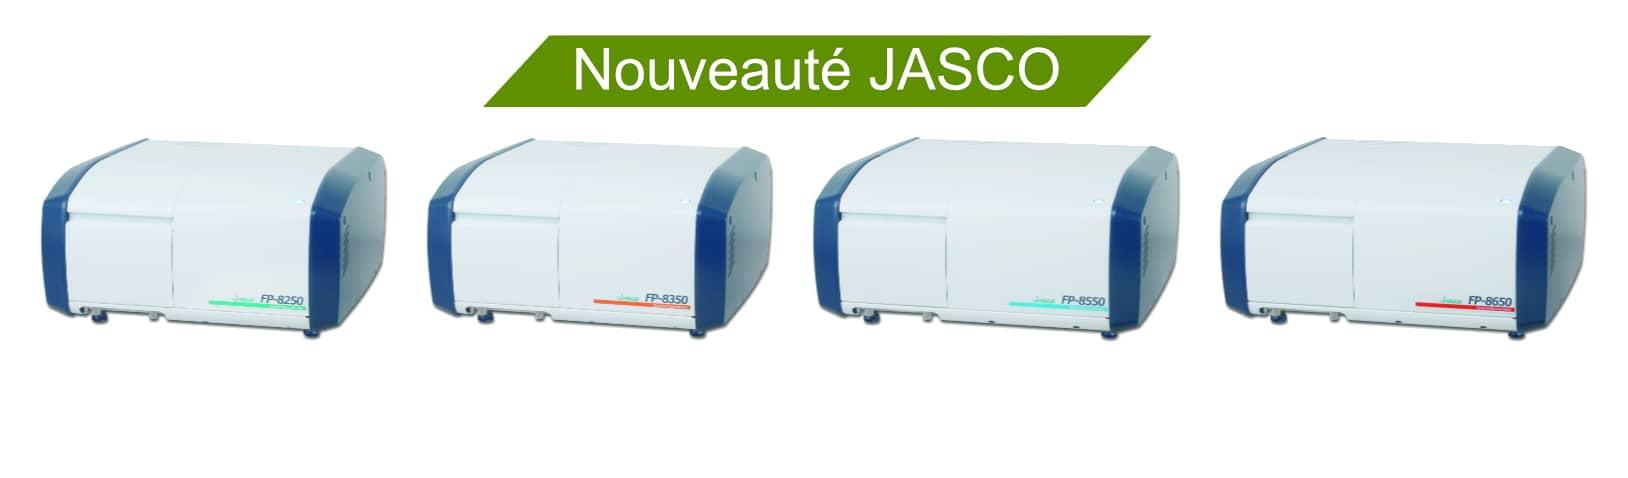 spectrofluorimetre-jasco-fp-8050